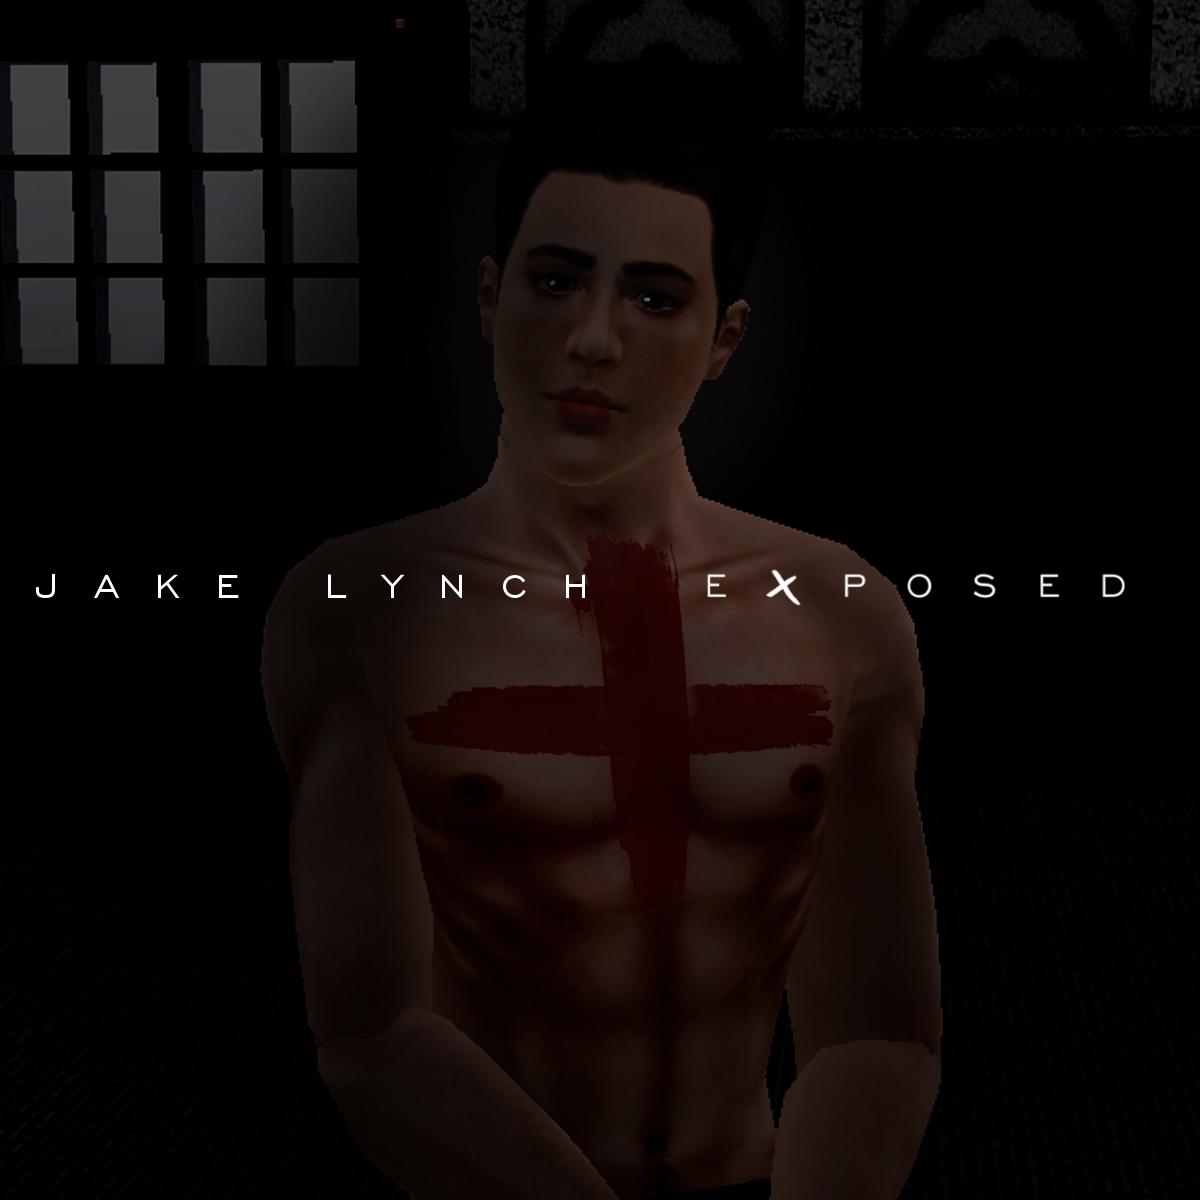 Jake Lynch discography